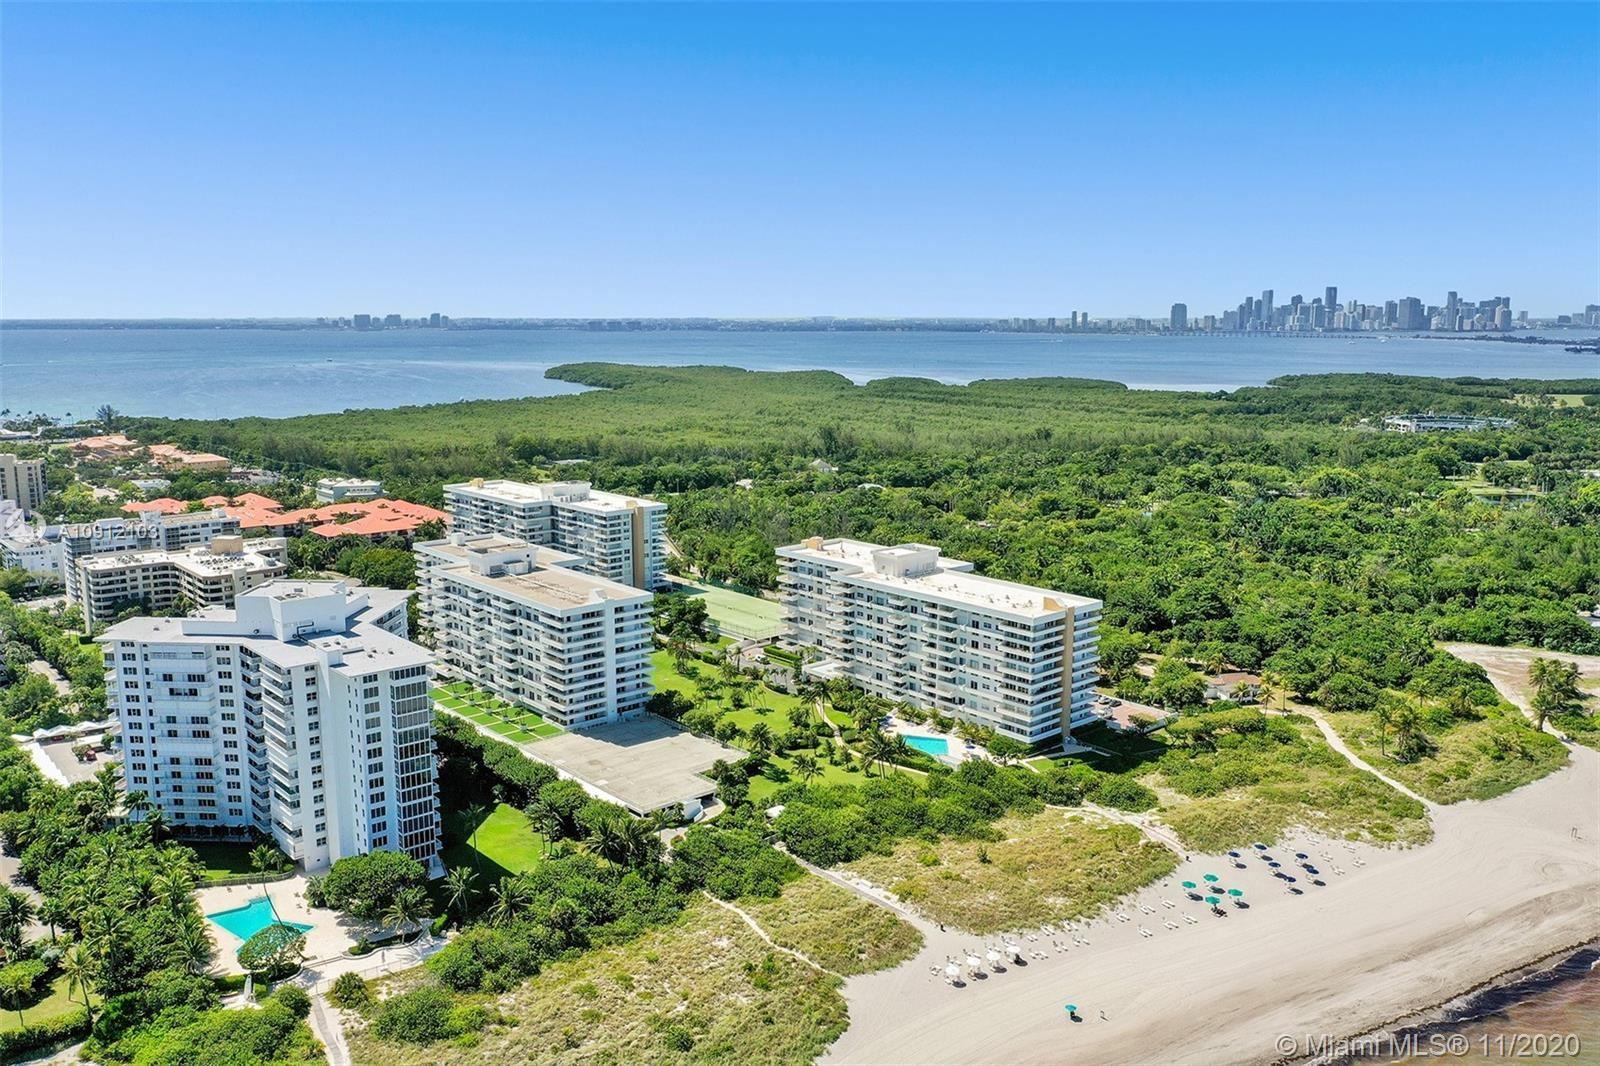 177 Ocean Lane Dr #203, Key Biscayne, FL 33149 - #: A10912103